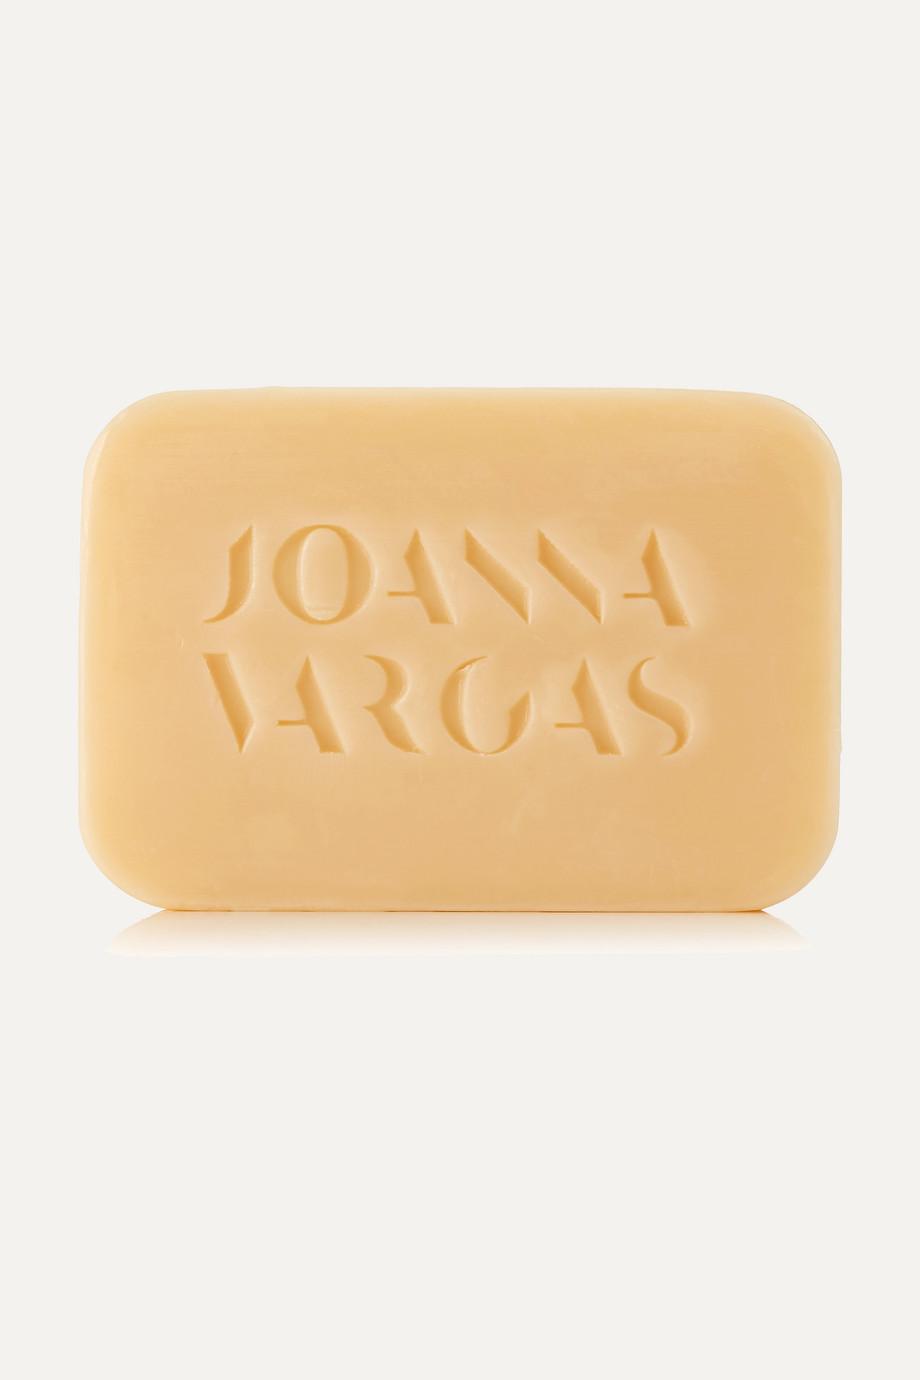 Joanna Vargas Cloud Bar, 100g